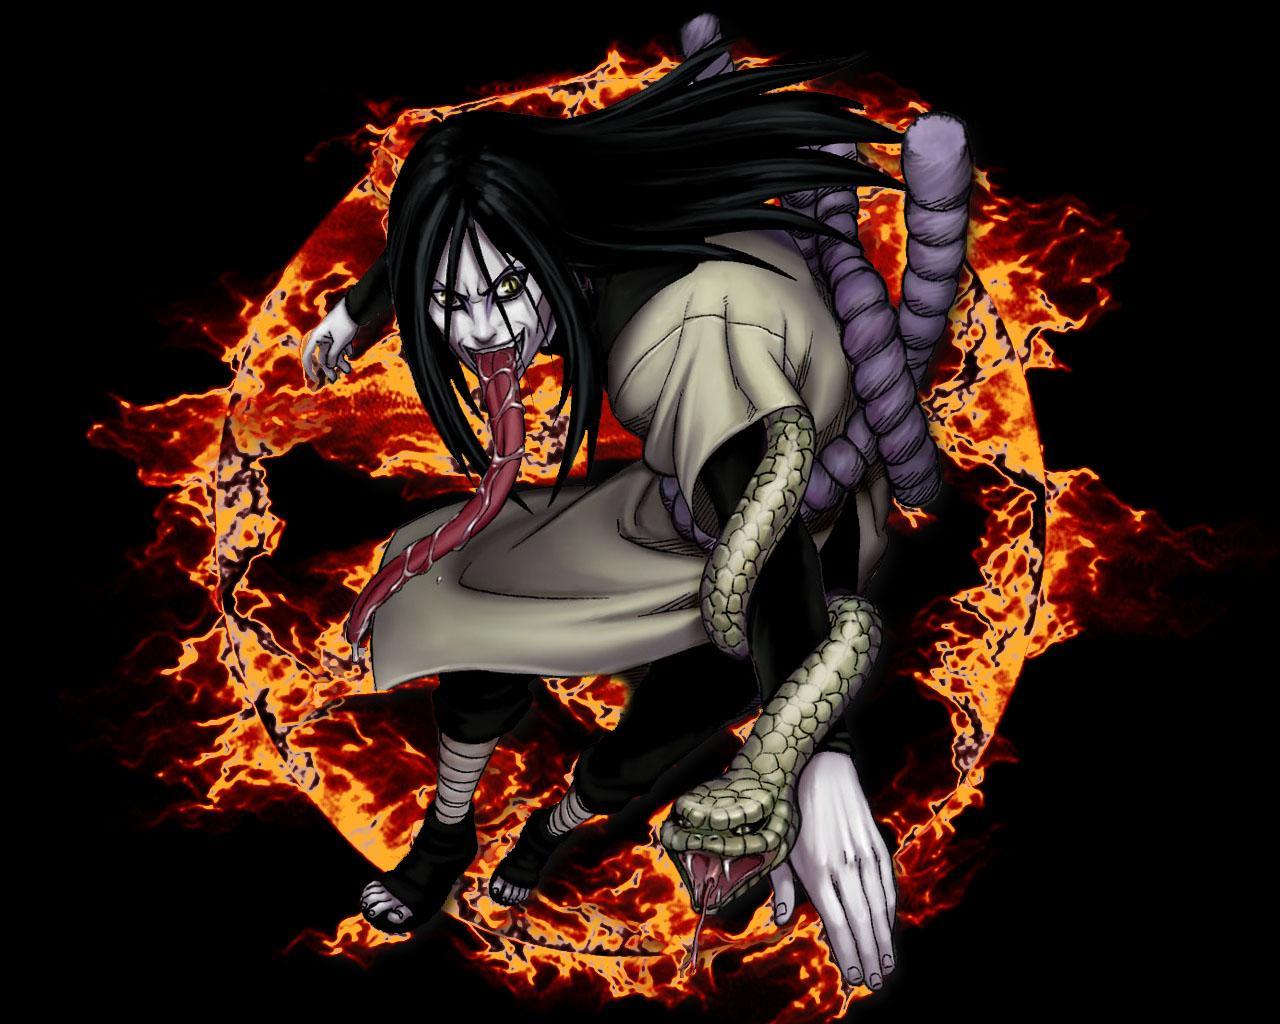 Naruto Nine Tails Vs Sasuke Demon New of naruto blog